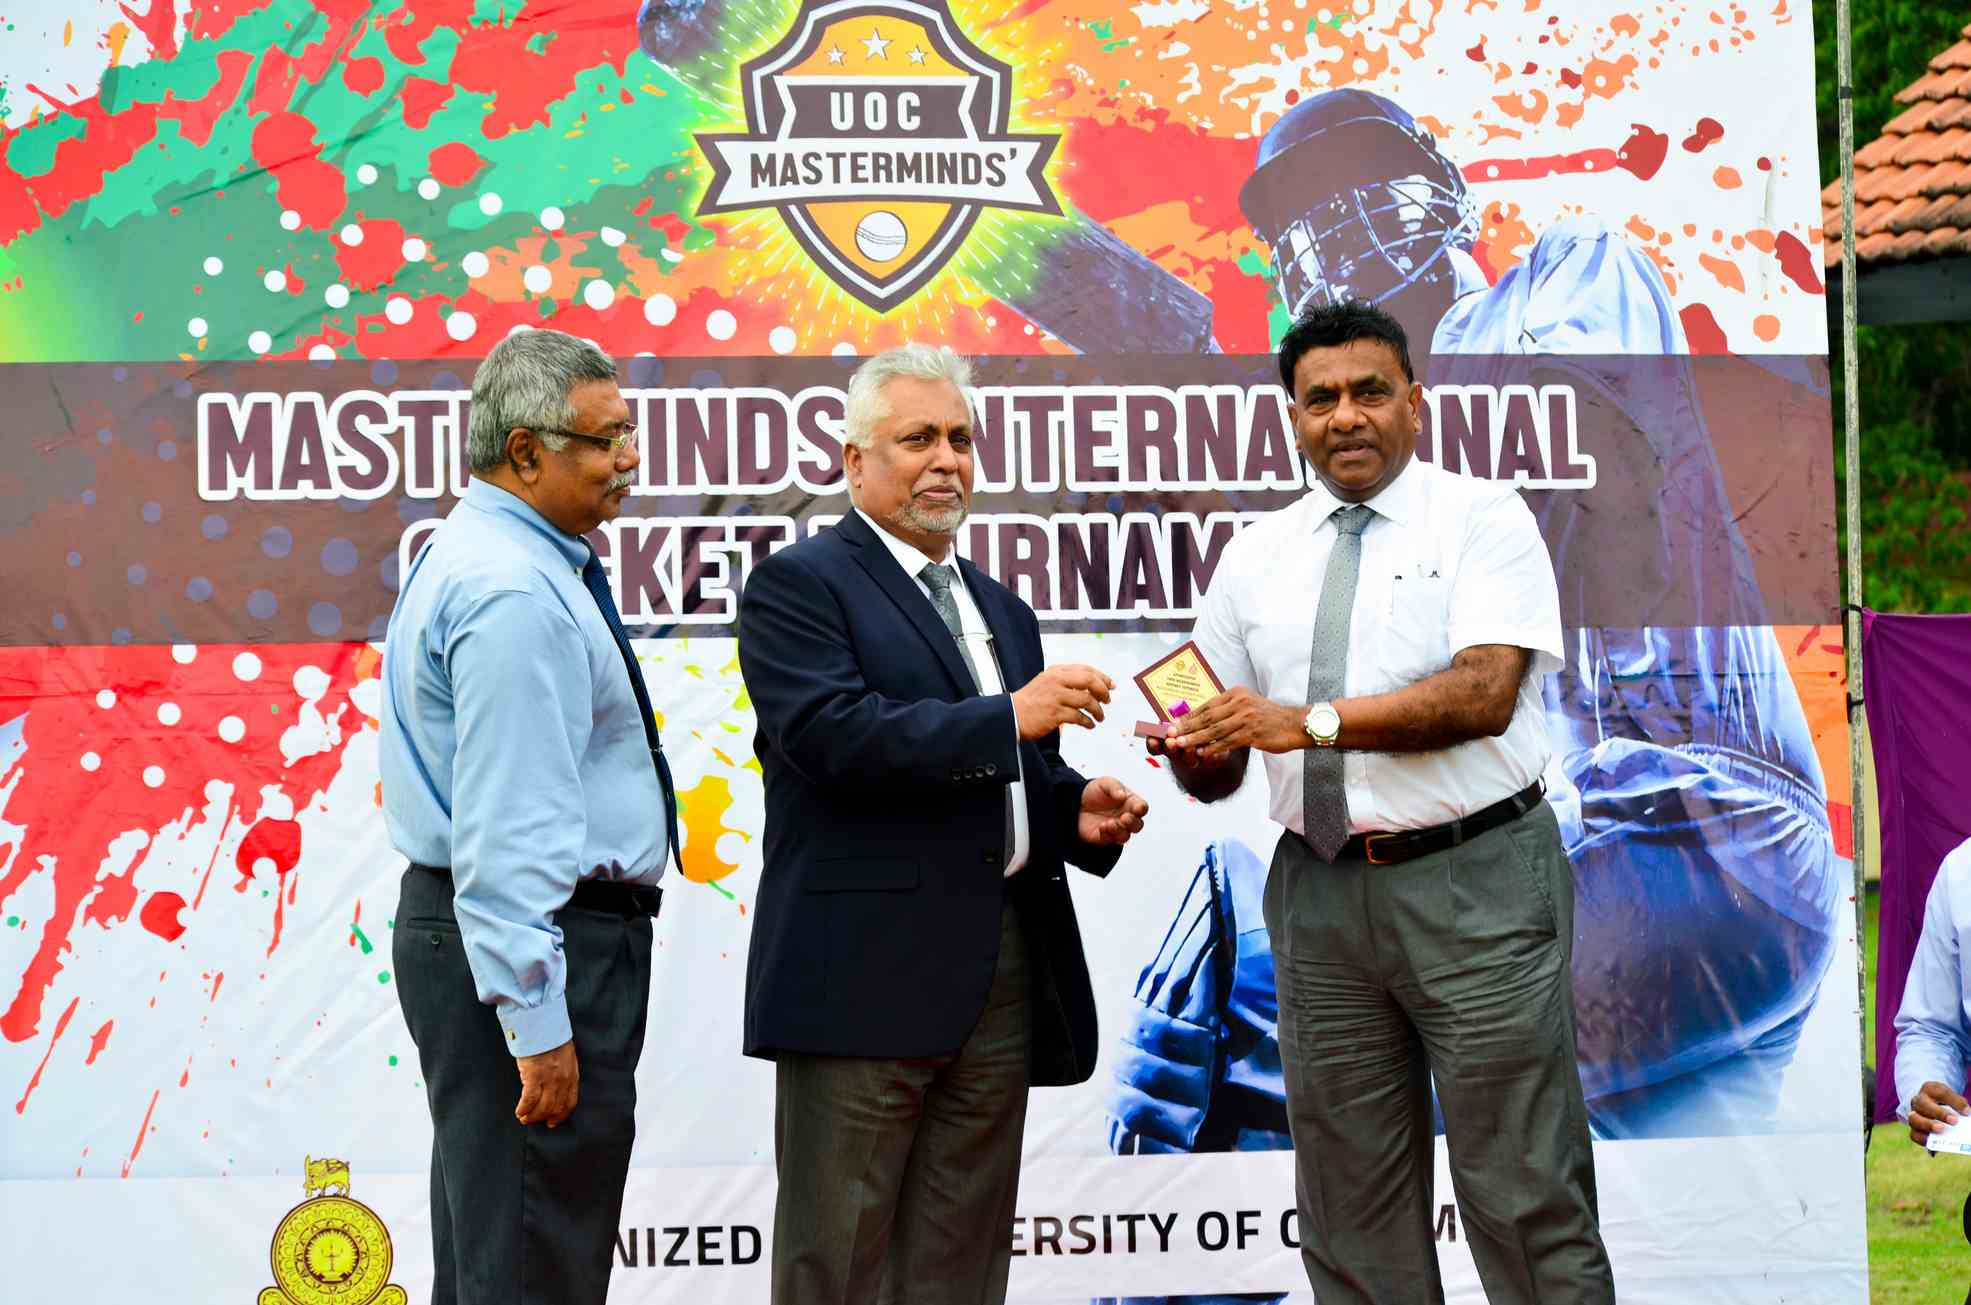 Masterminds' International Cricket Tournament – 2017